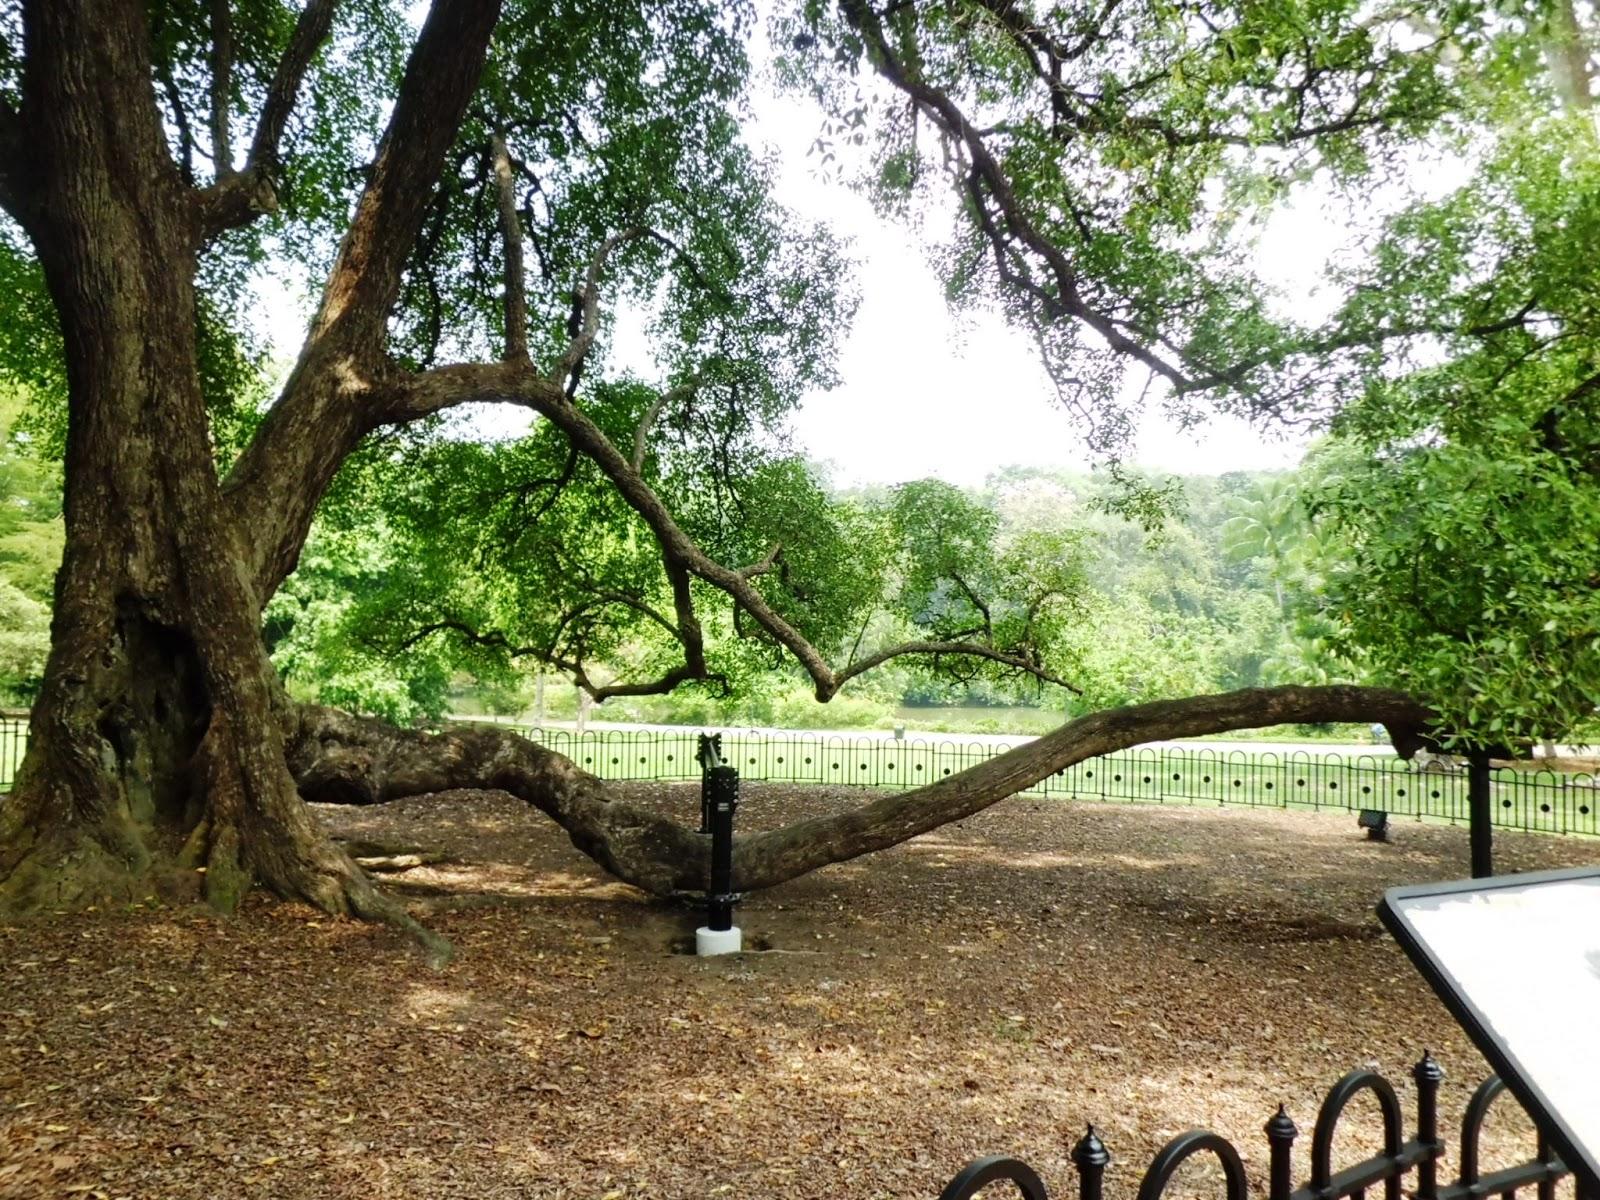 Singapore Botanic Gardens - Heritage Tree. Tembusu (Fagraea fragrans)